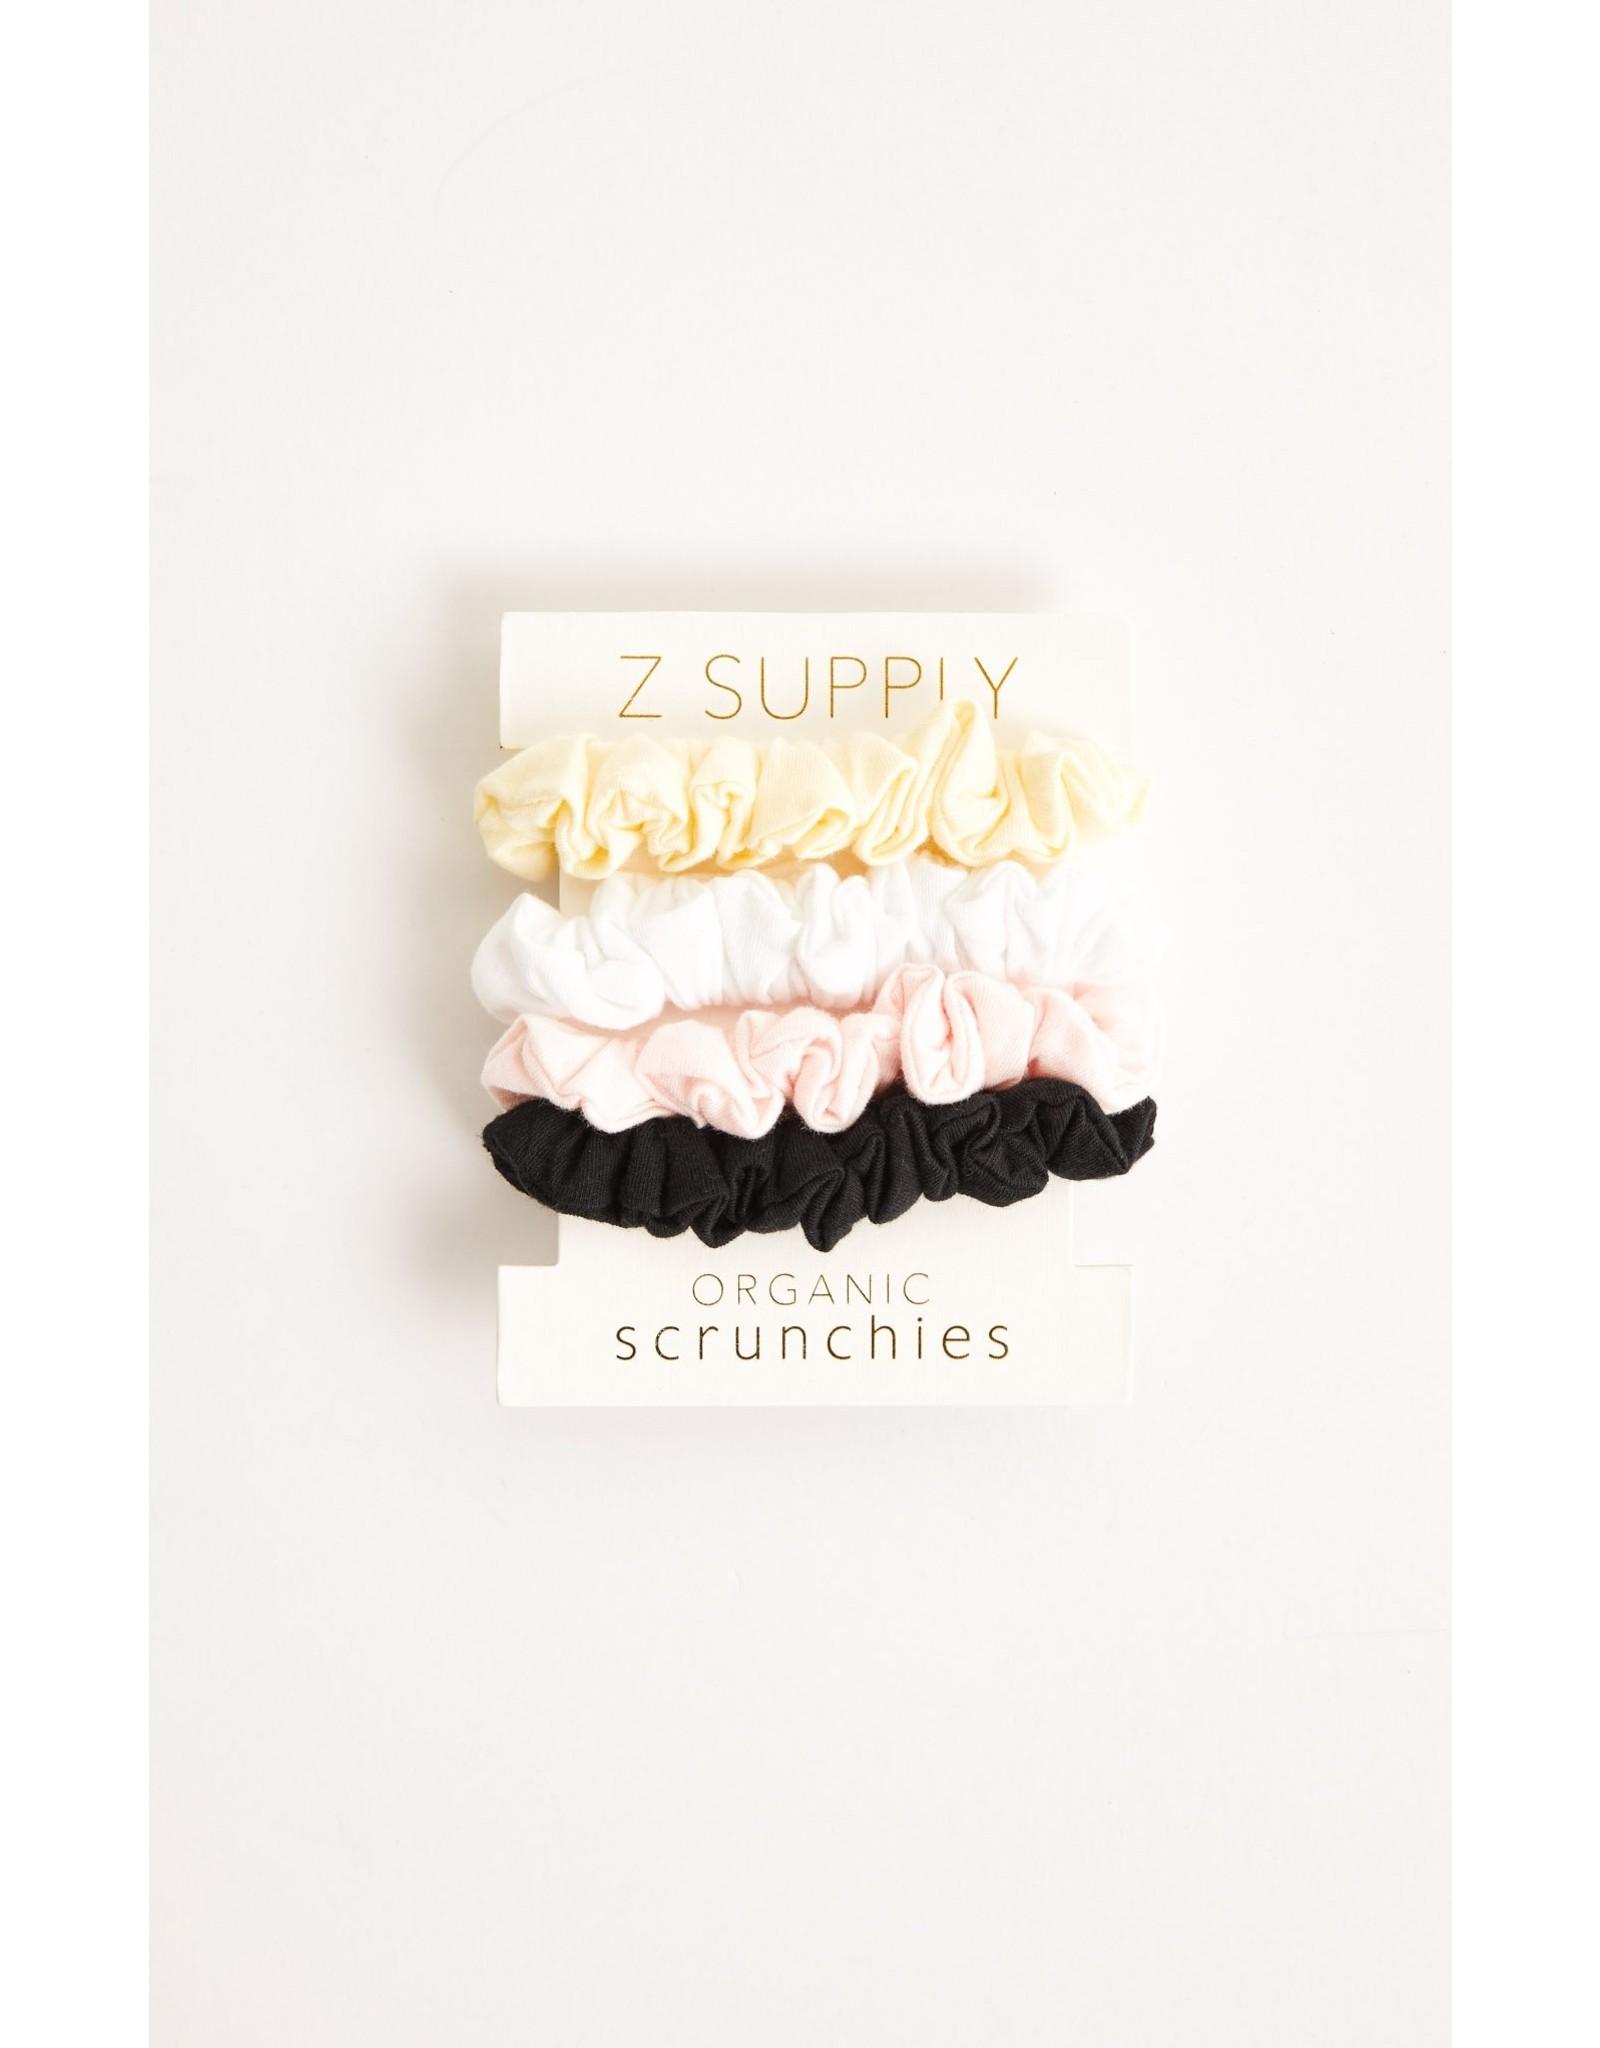 Z Supply - Organic Scrunchies (4 pack)